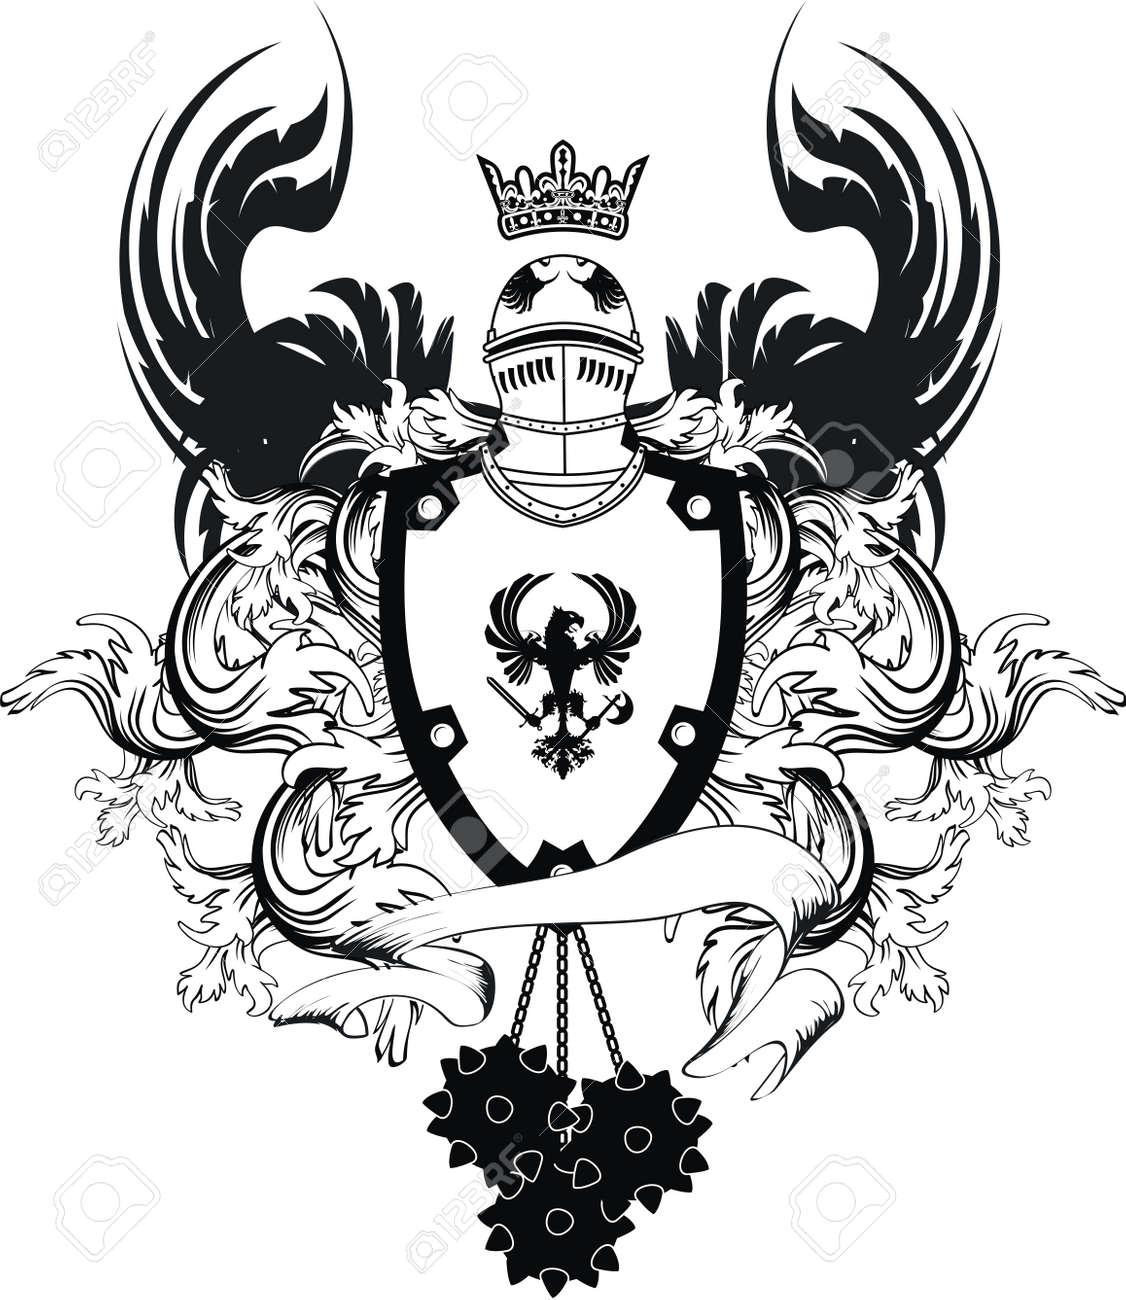 heraldic helmet coat of arms in vector format royalty free cliparts rh 123rf com coat of arms vector elements coat of arms vector elements